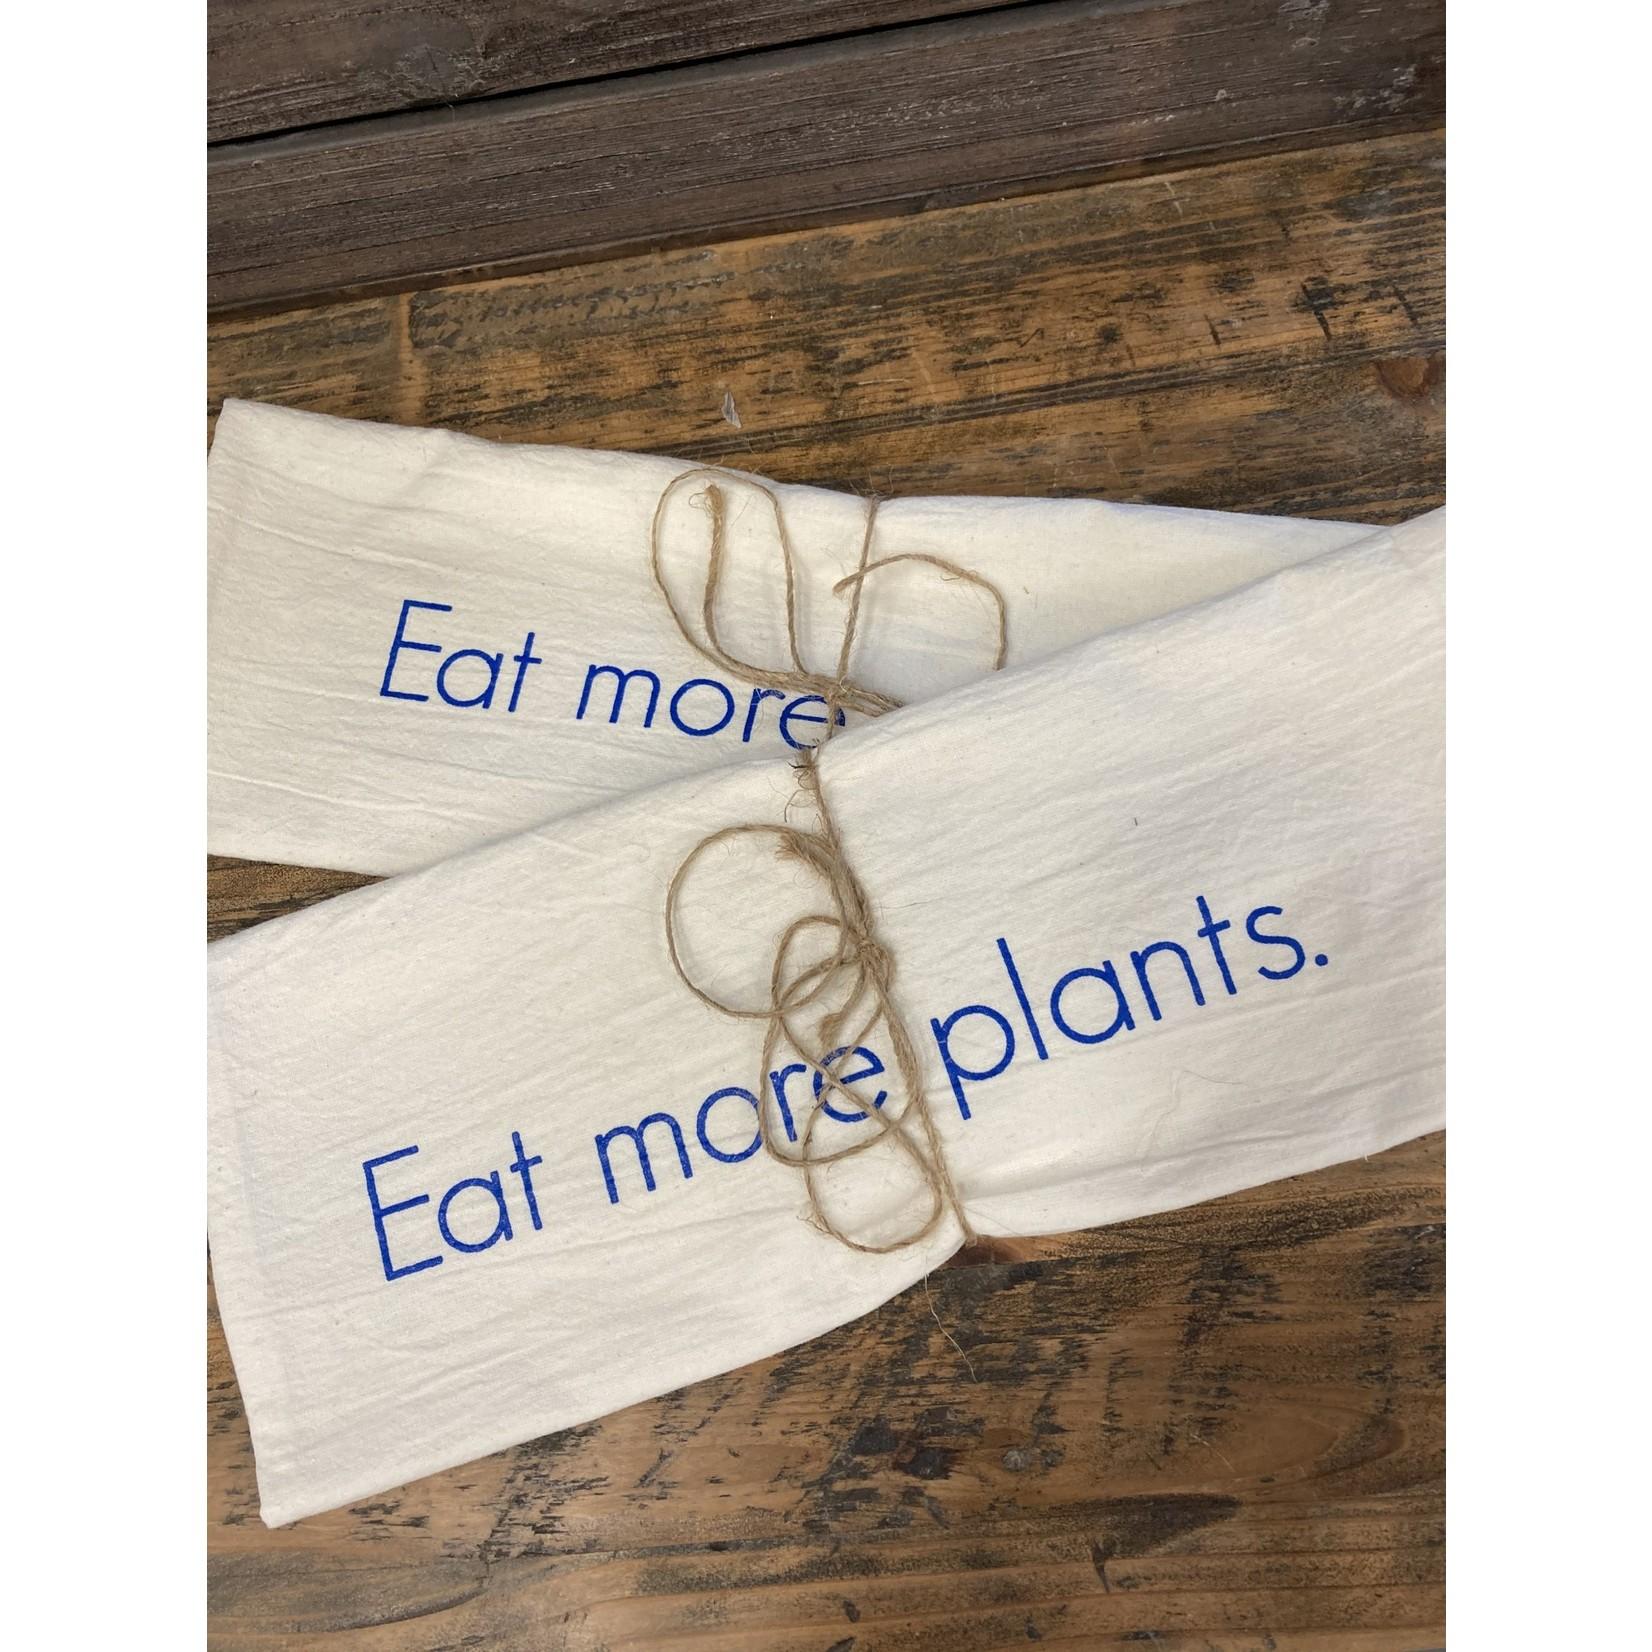 Sarah Kaminski Flour Sack 100% cotton kitchen towel Blue print Eat more plants